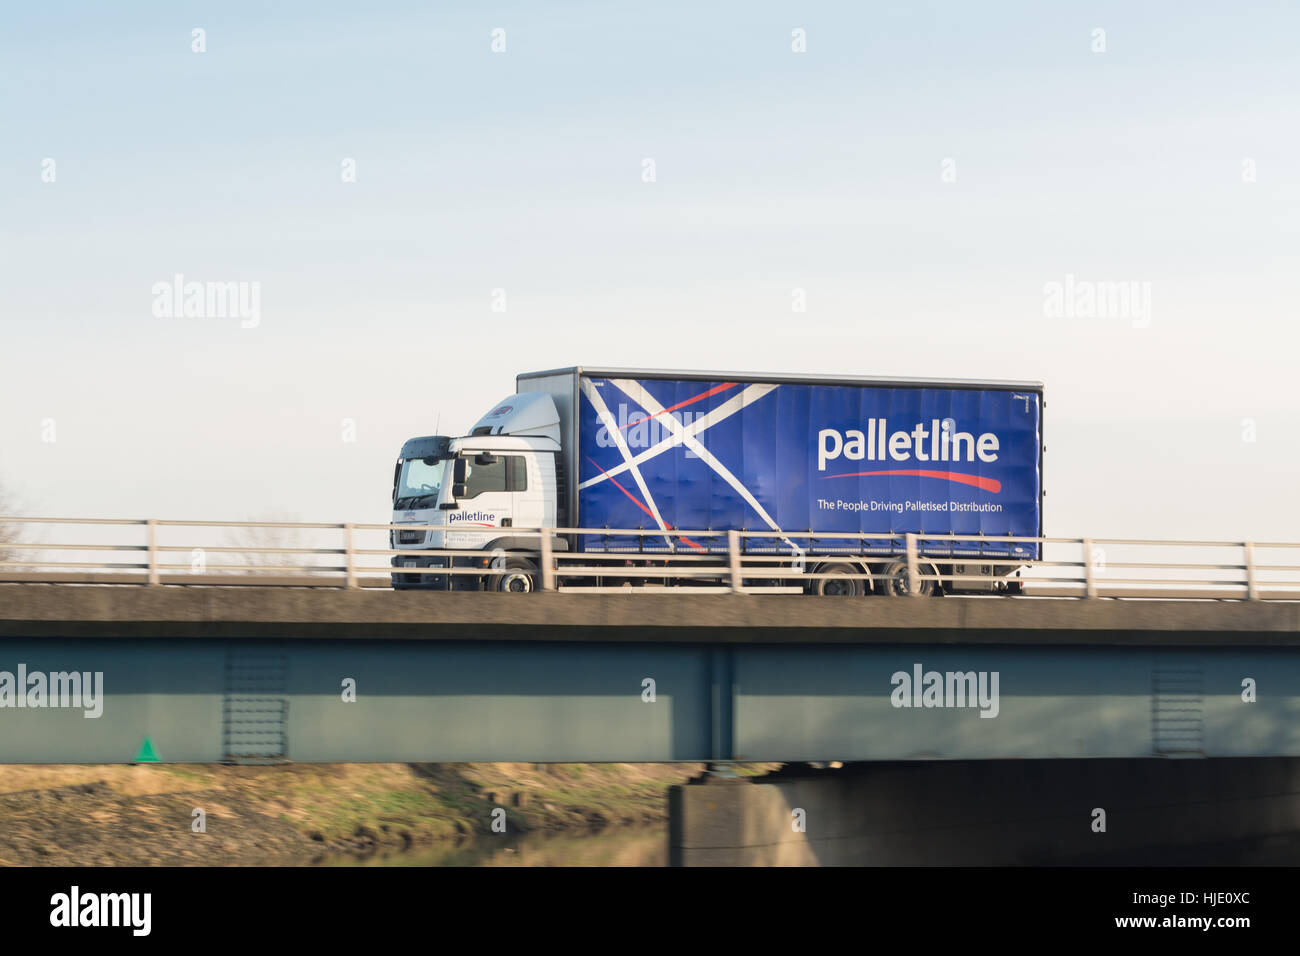 palletline palletised distribution lorry - Scotland, UK - Stock Image